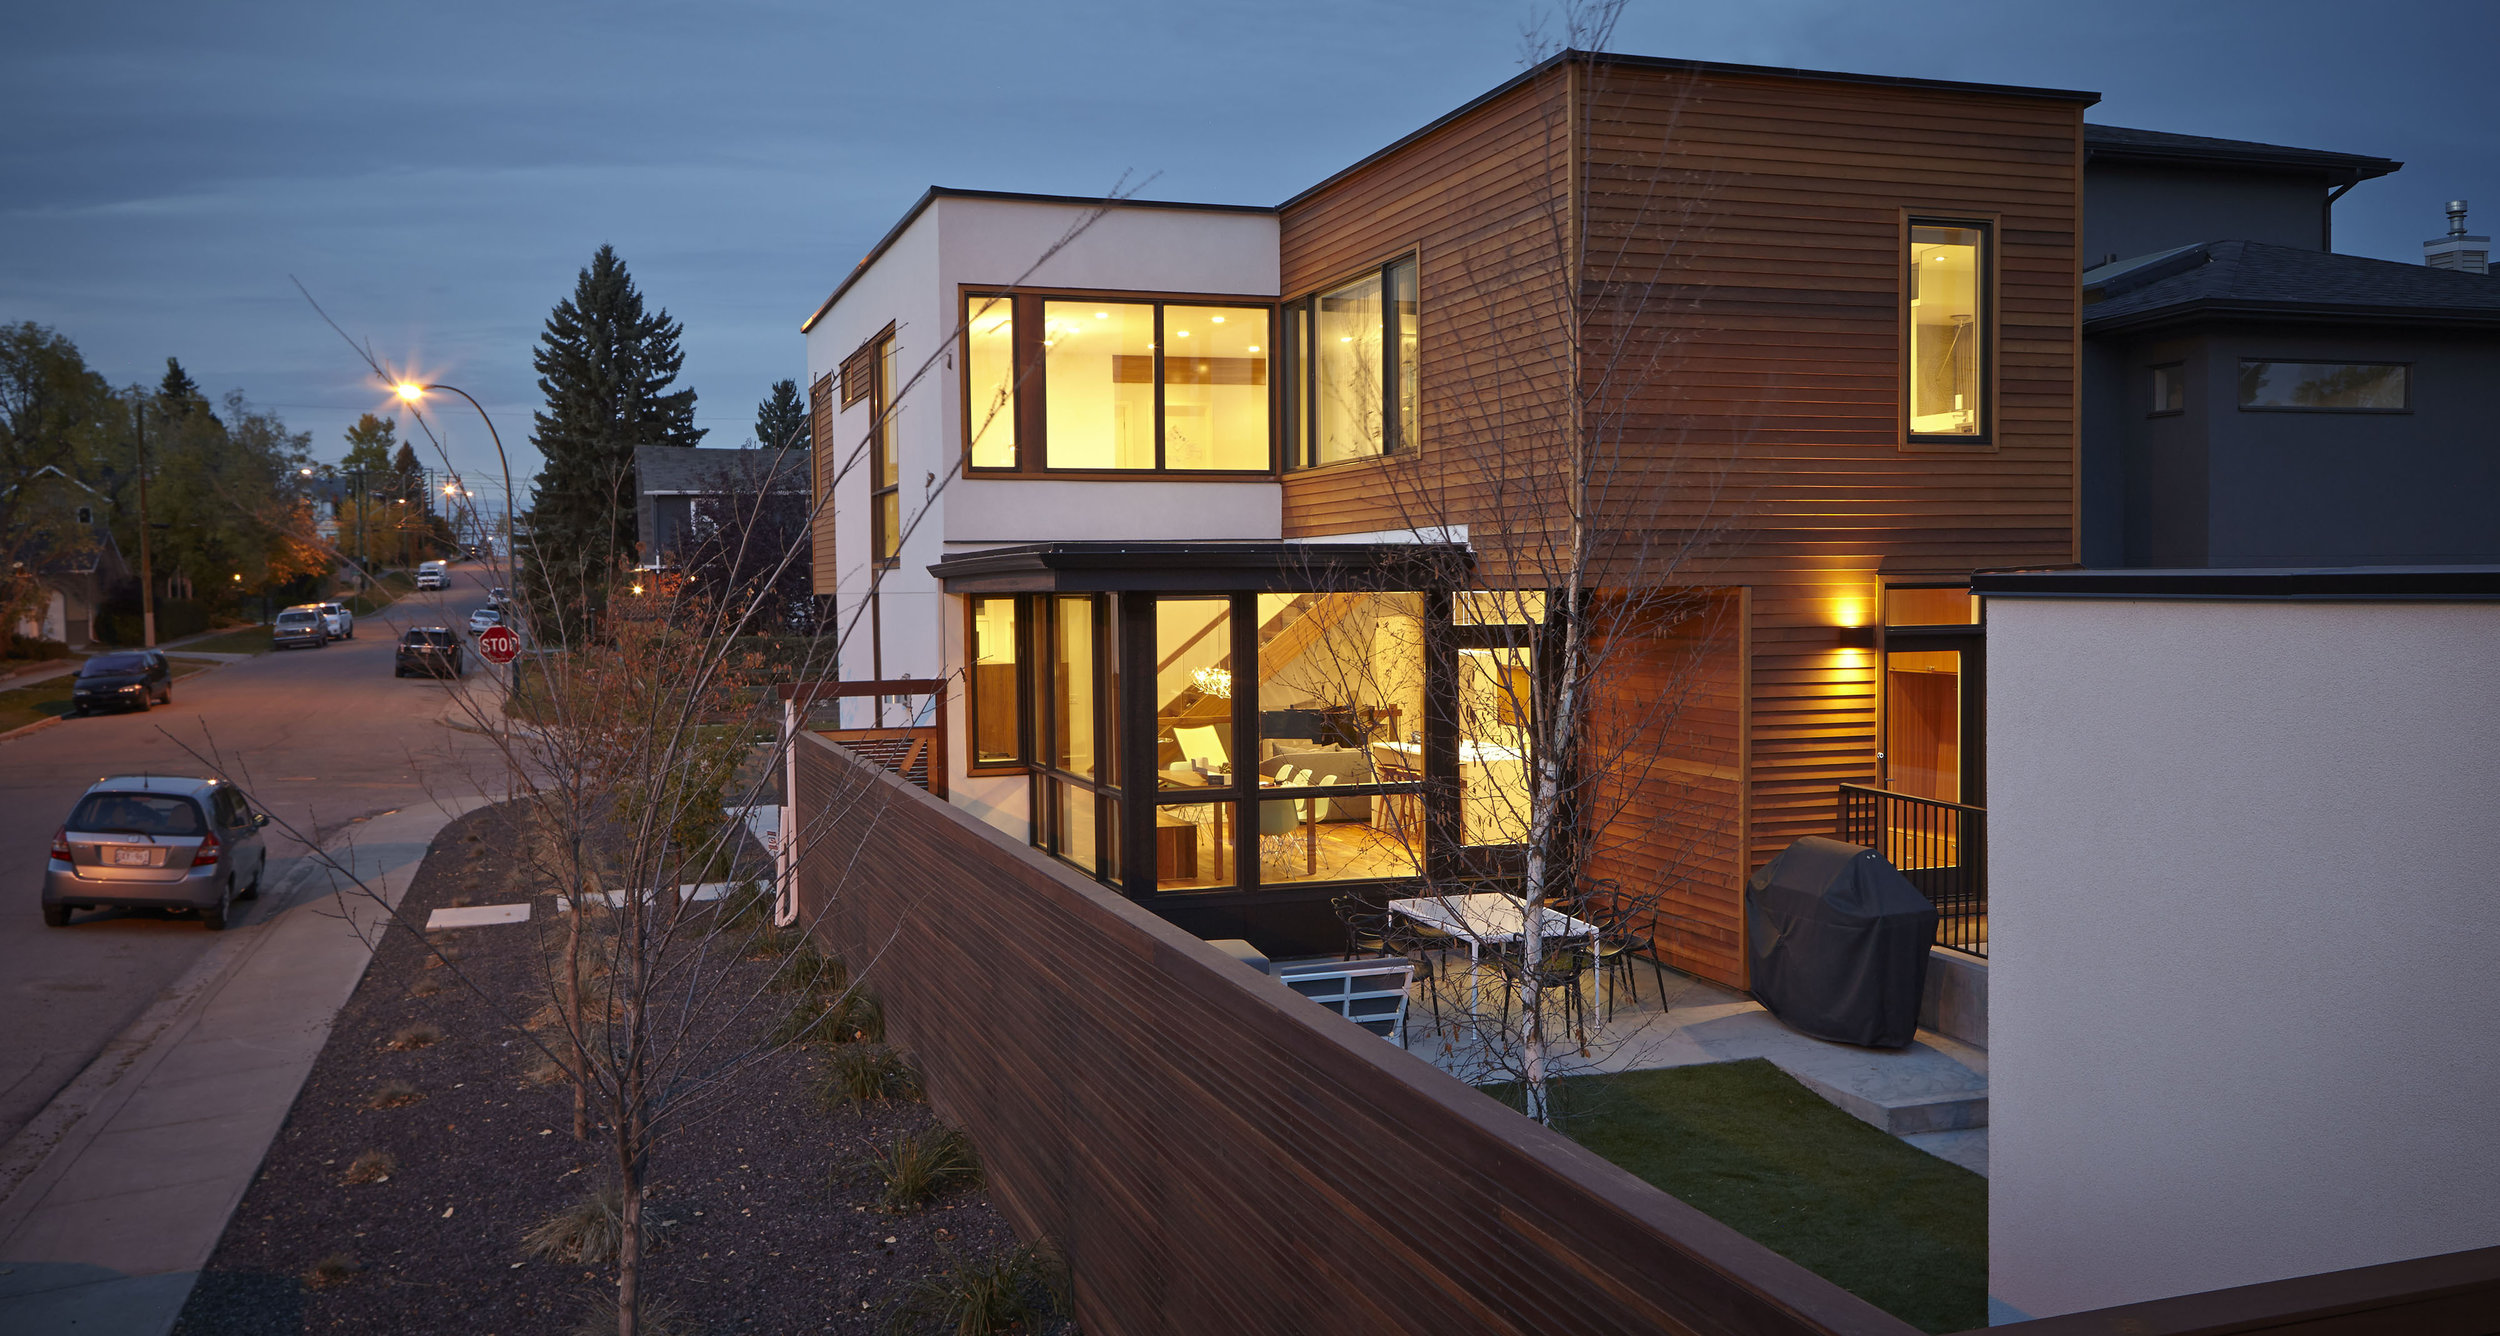 turkel_modern_design_prefab_home_bankview_house_calgary_exterior.jpg